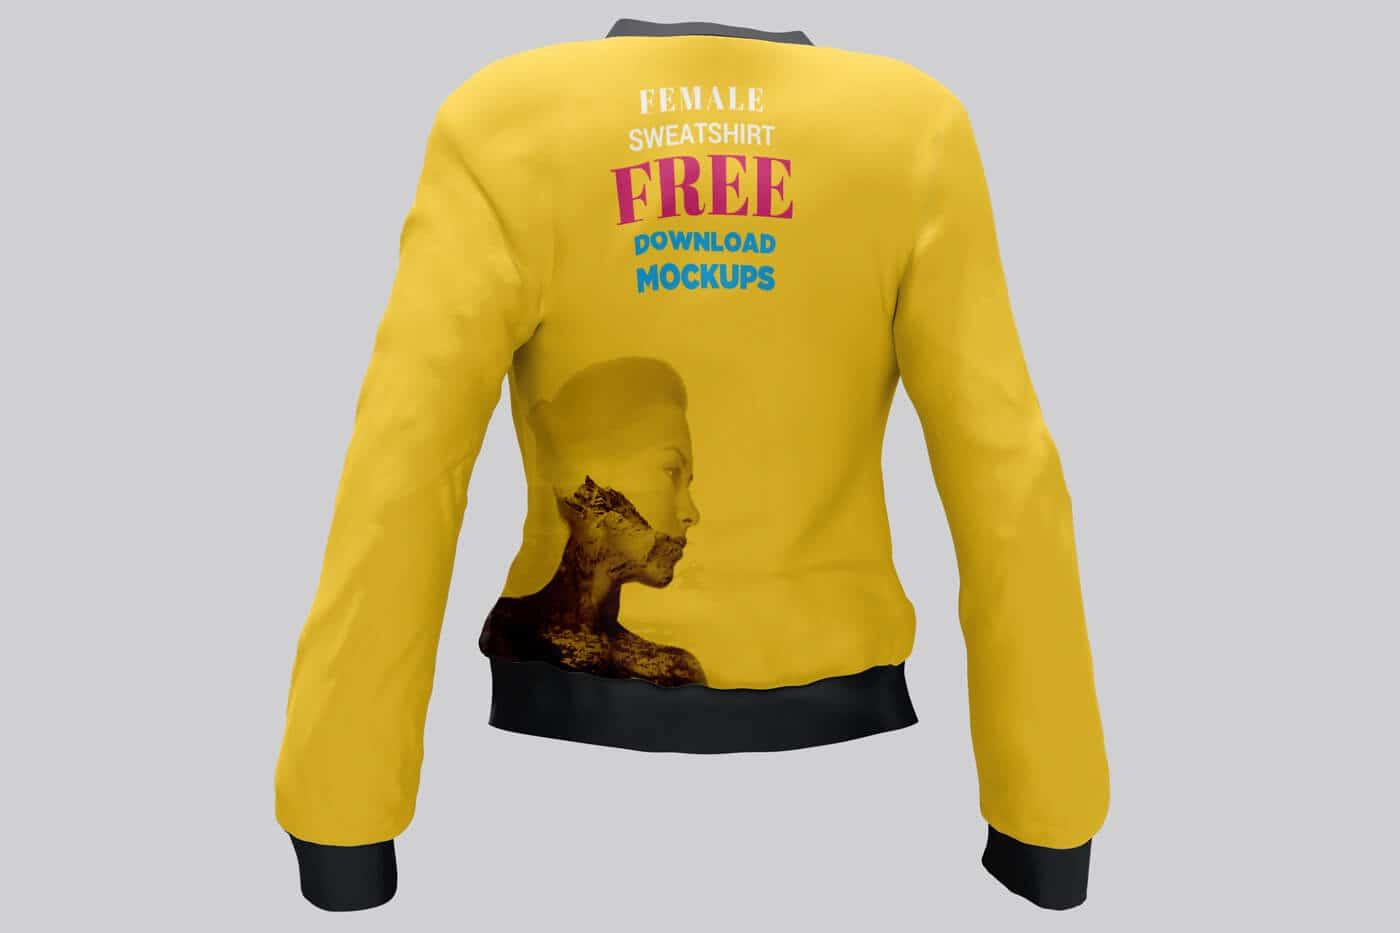 Free Female Sweatshirt Mockup 02